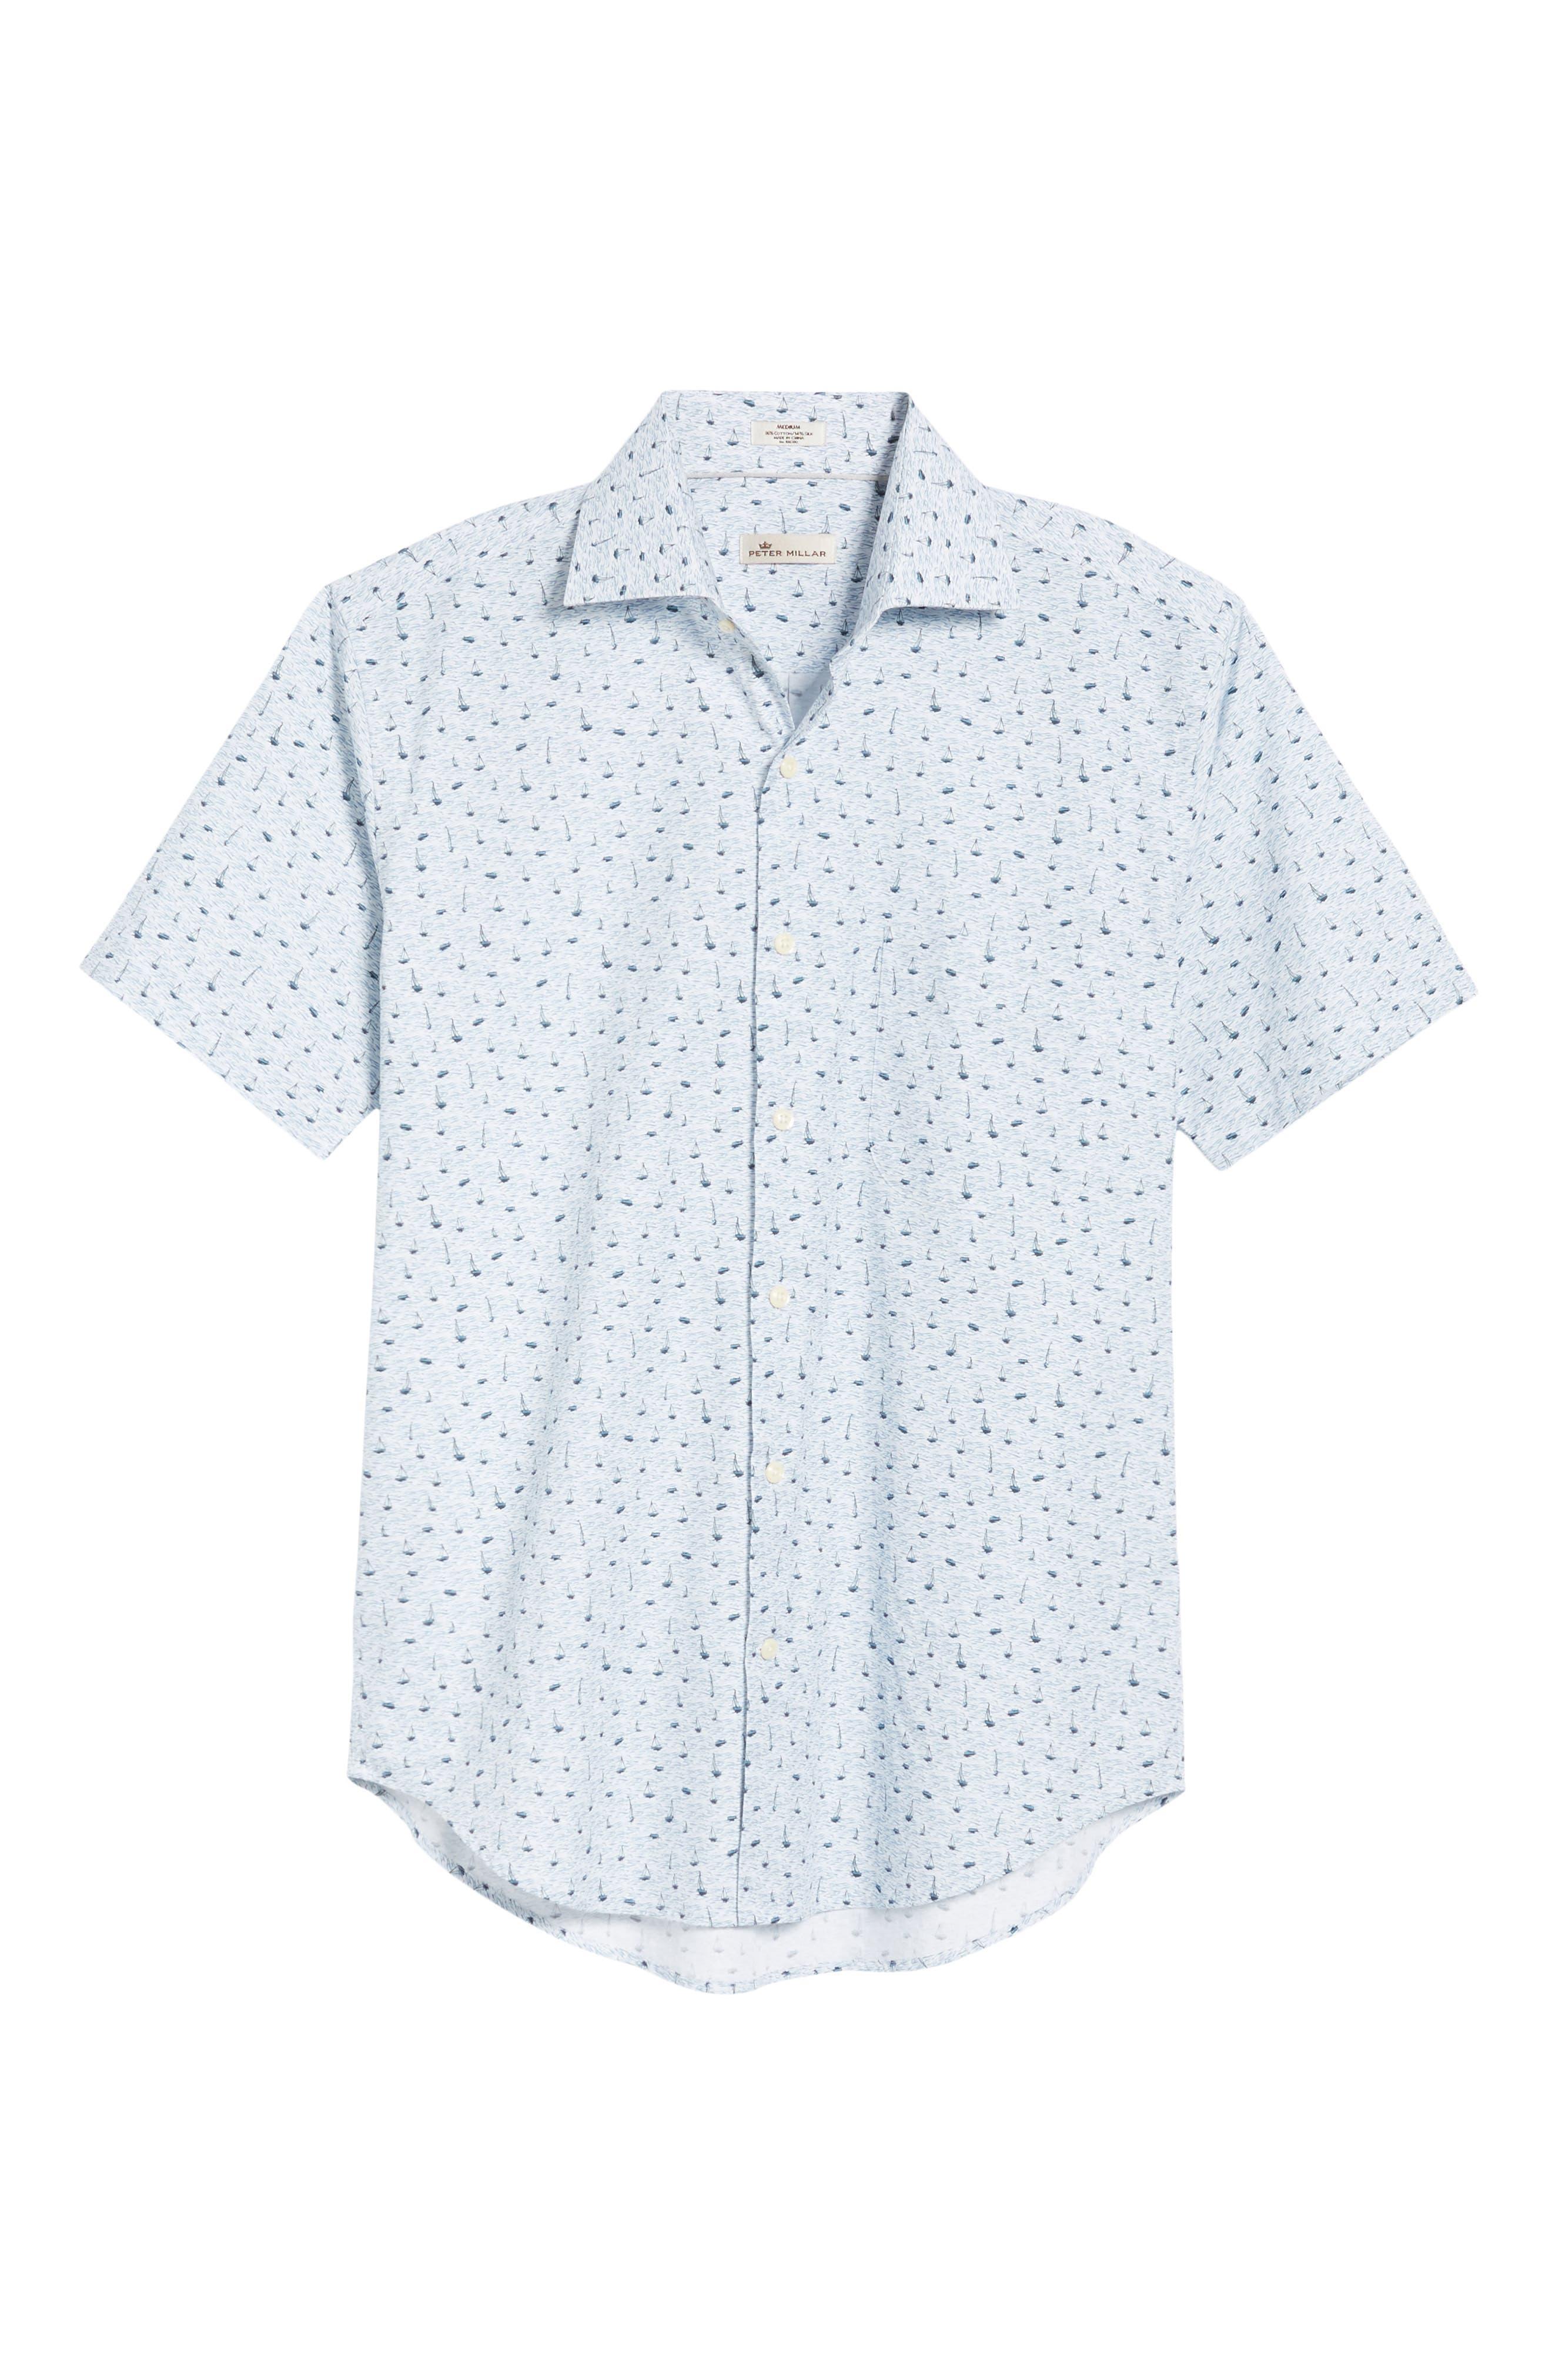 Stormy Tide Regular Fit Sport Shirt,                             Alternate thumbnail 6, color,                             ATLANTIC BLUE